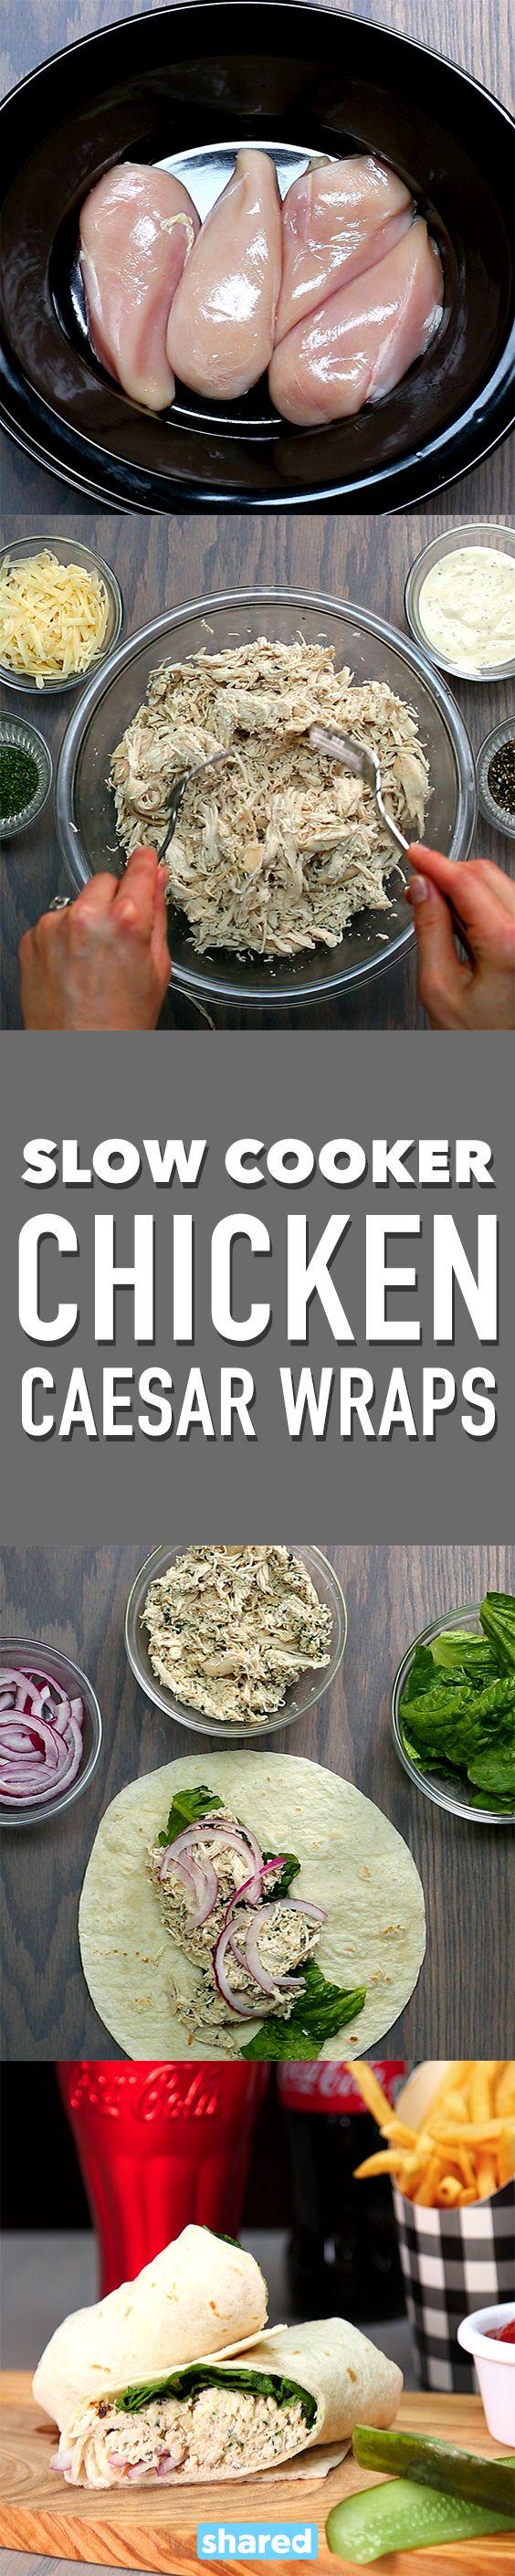 Slow Cooker Chicken Caesar Wraps